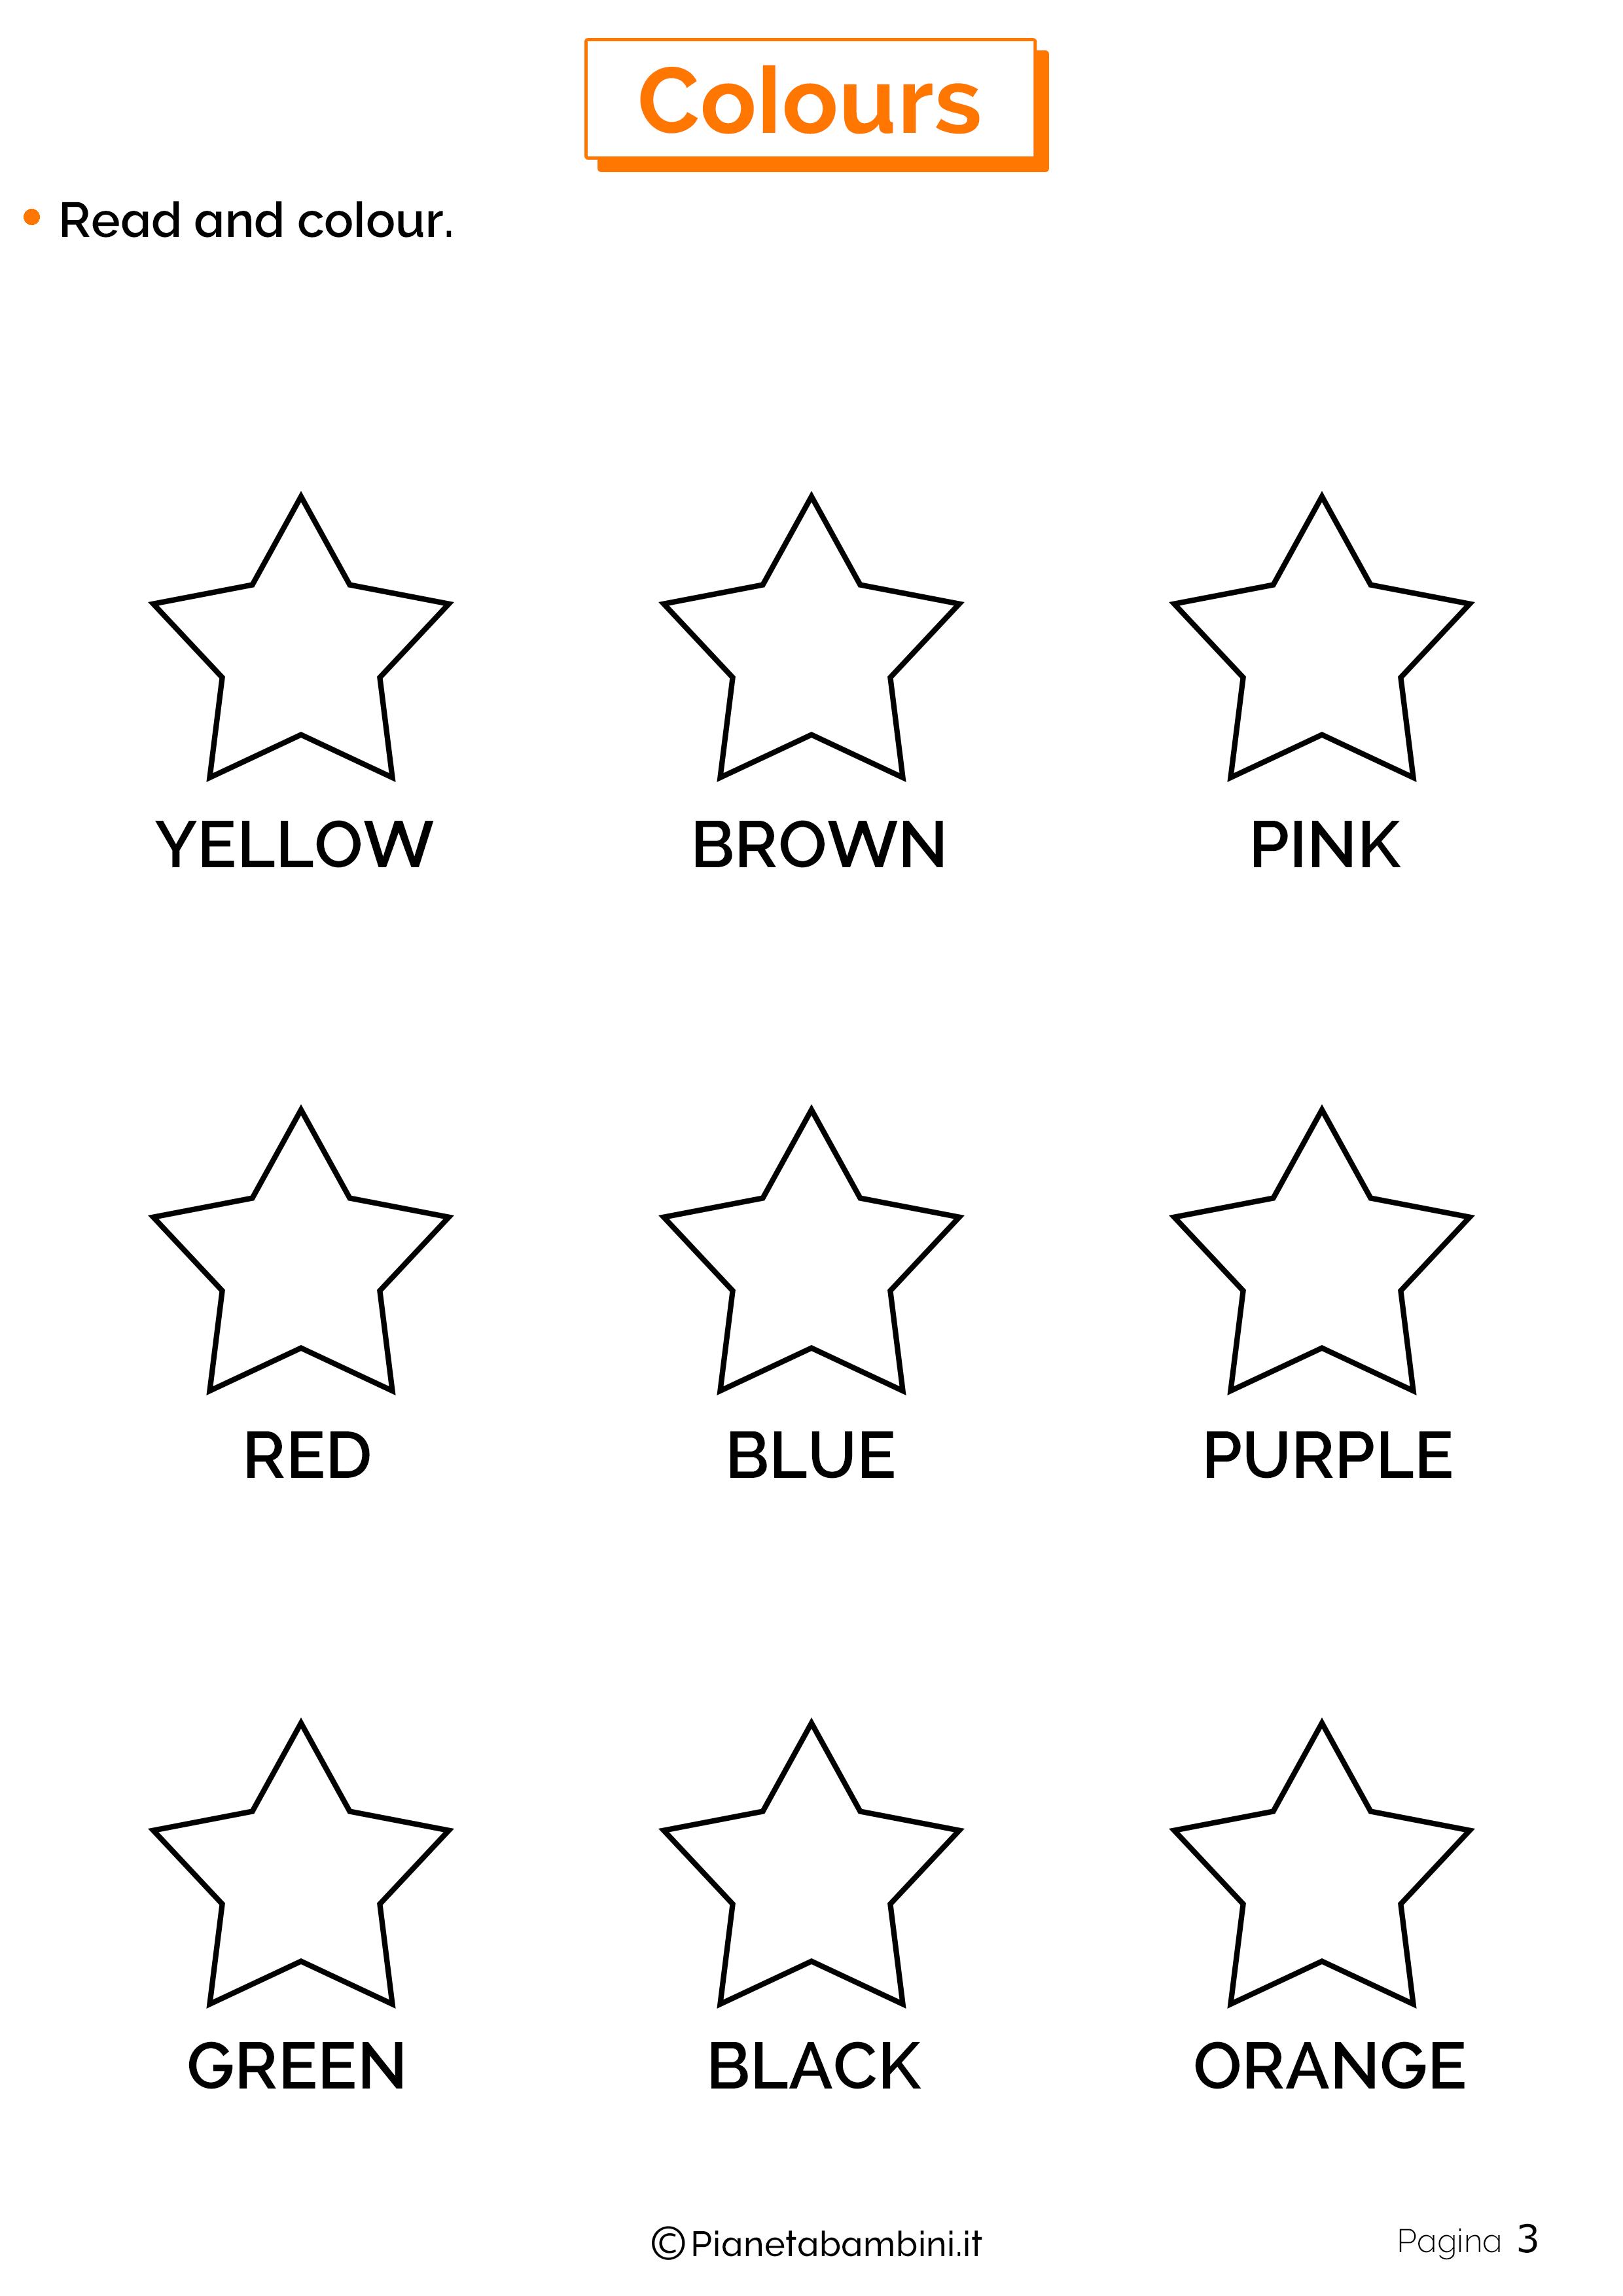 Scheda sui colori in inglese 3